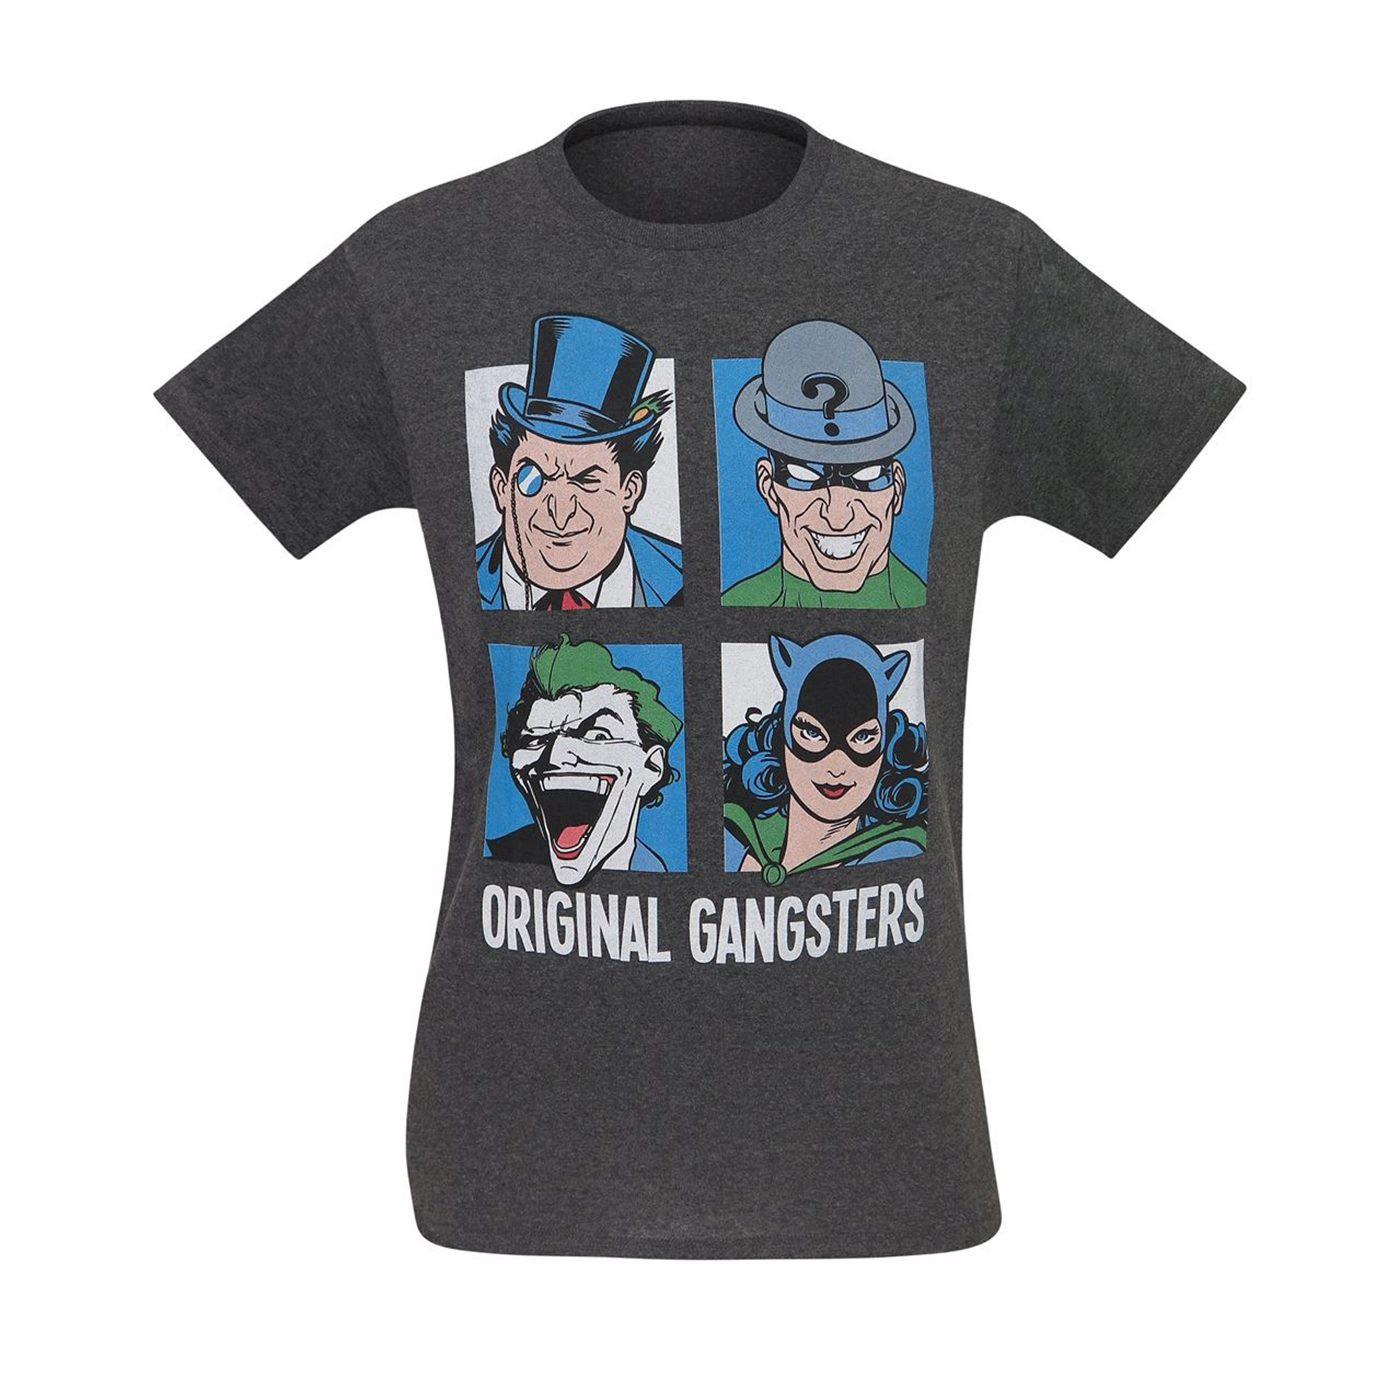 Gotham's Original Gangsters Men's T-Shirt